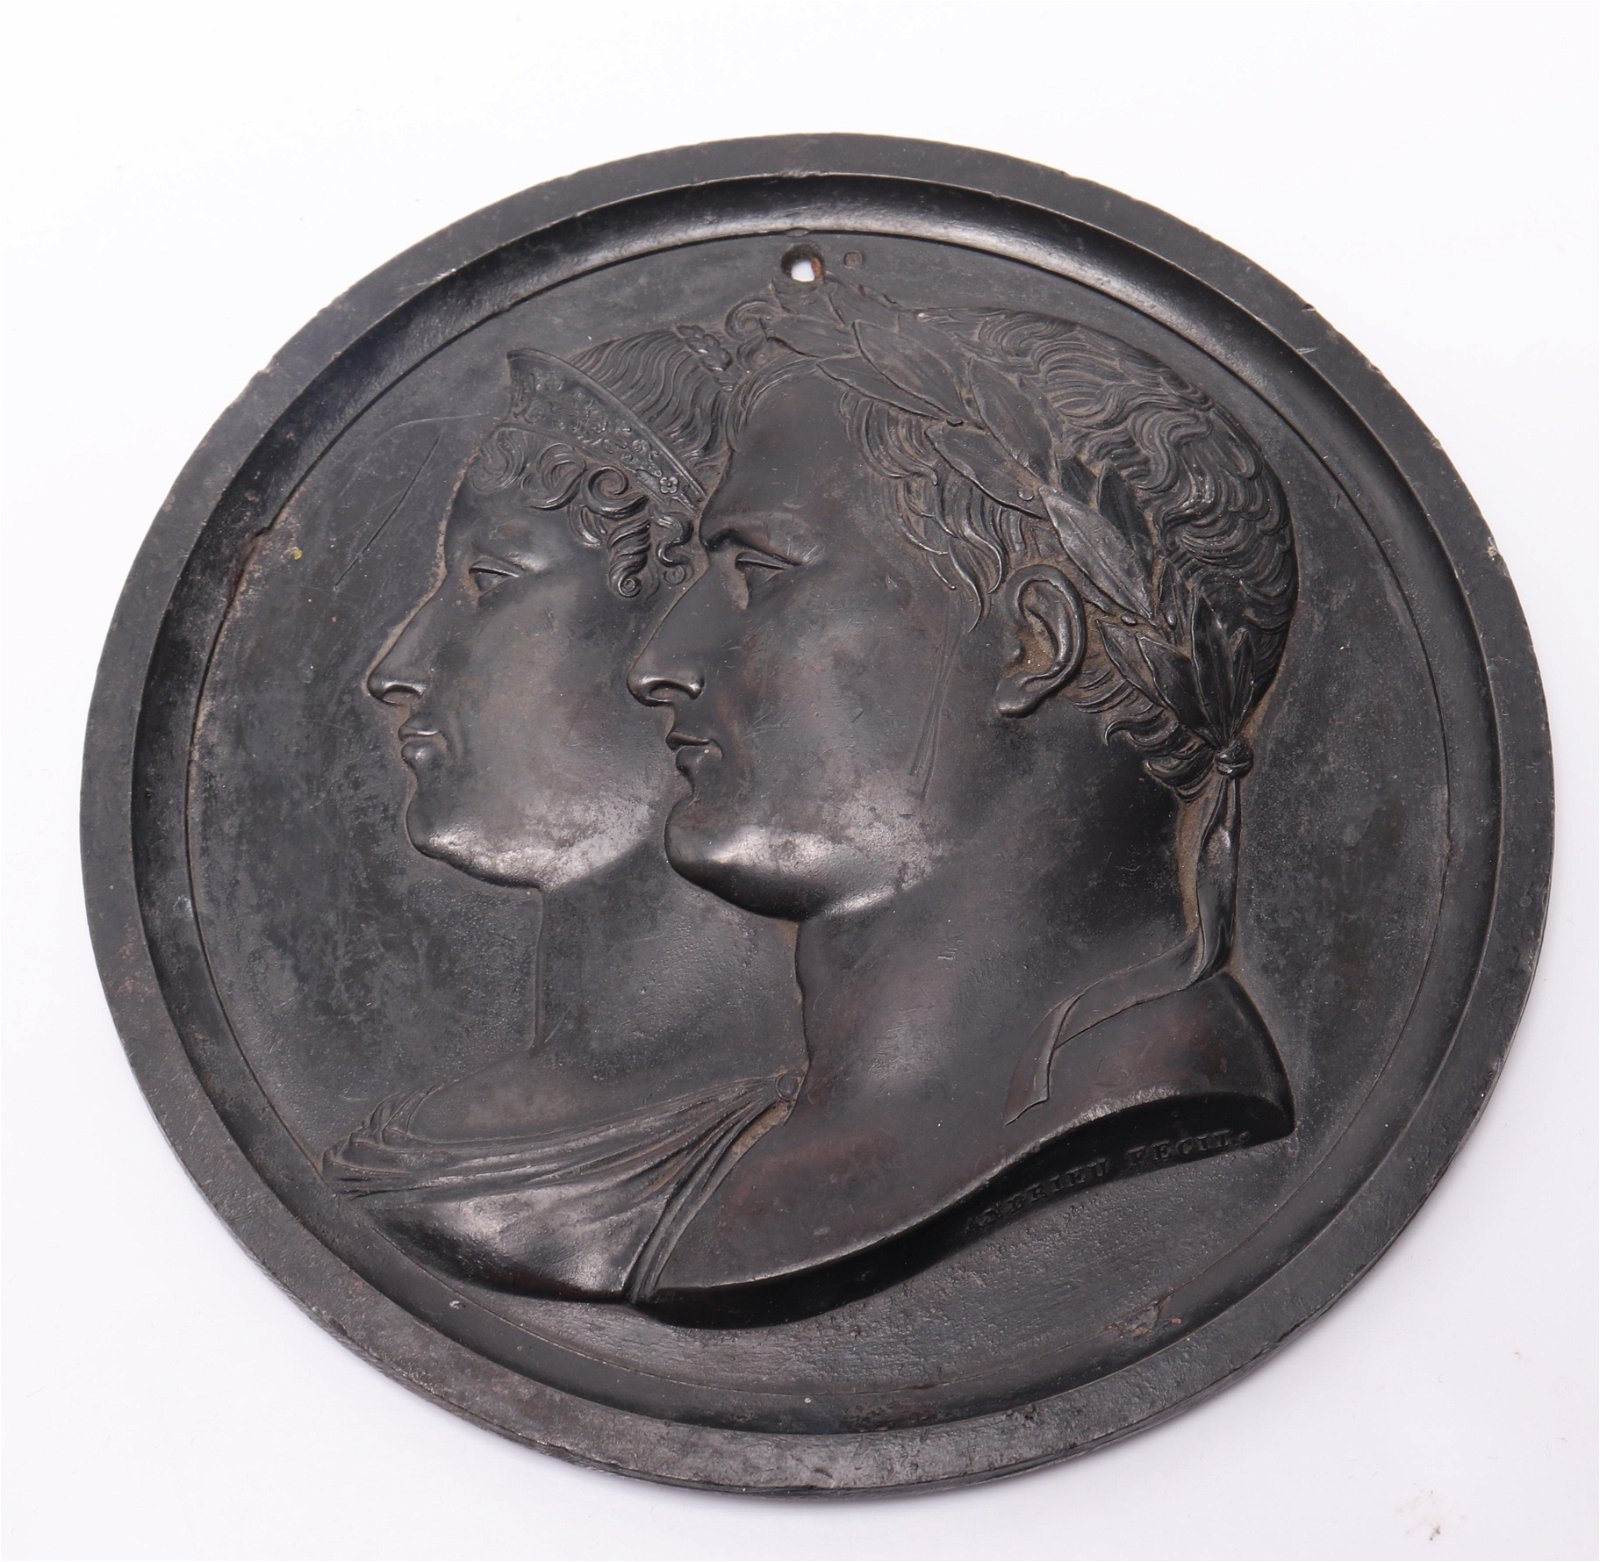 Patinated Metal Portrait Profile Relief Medallion